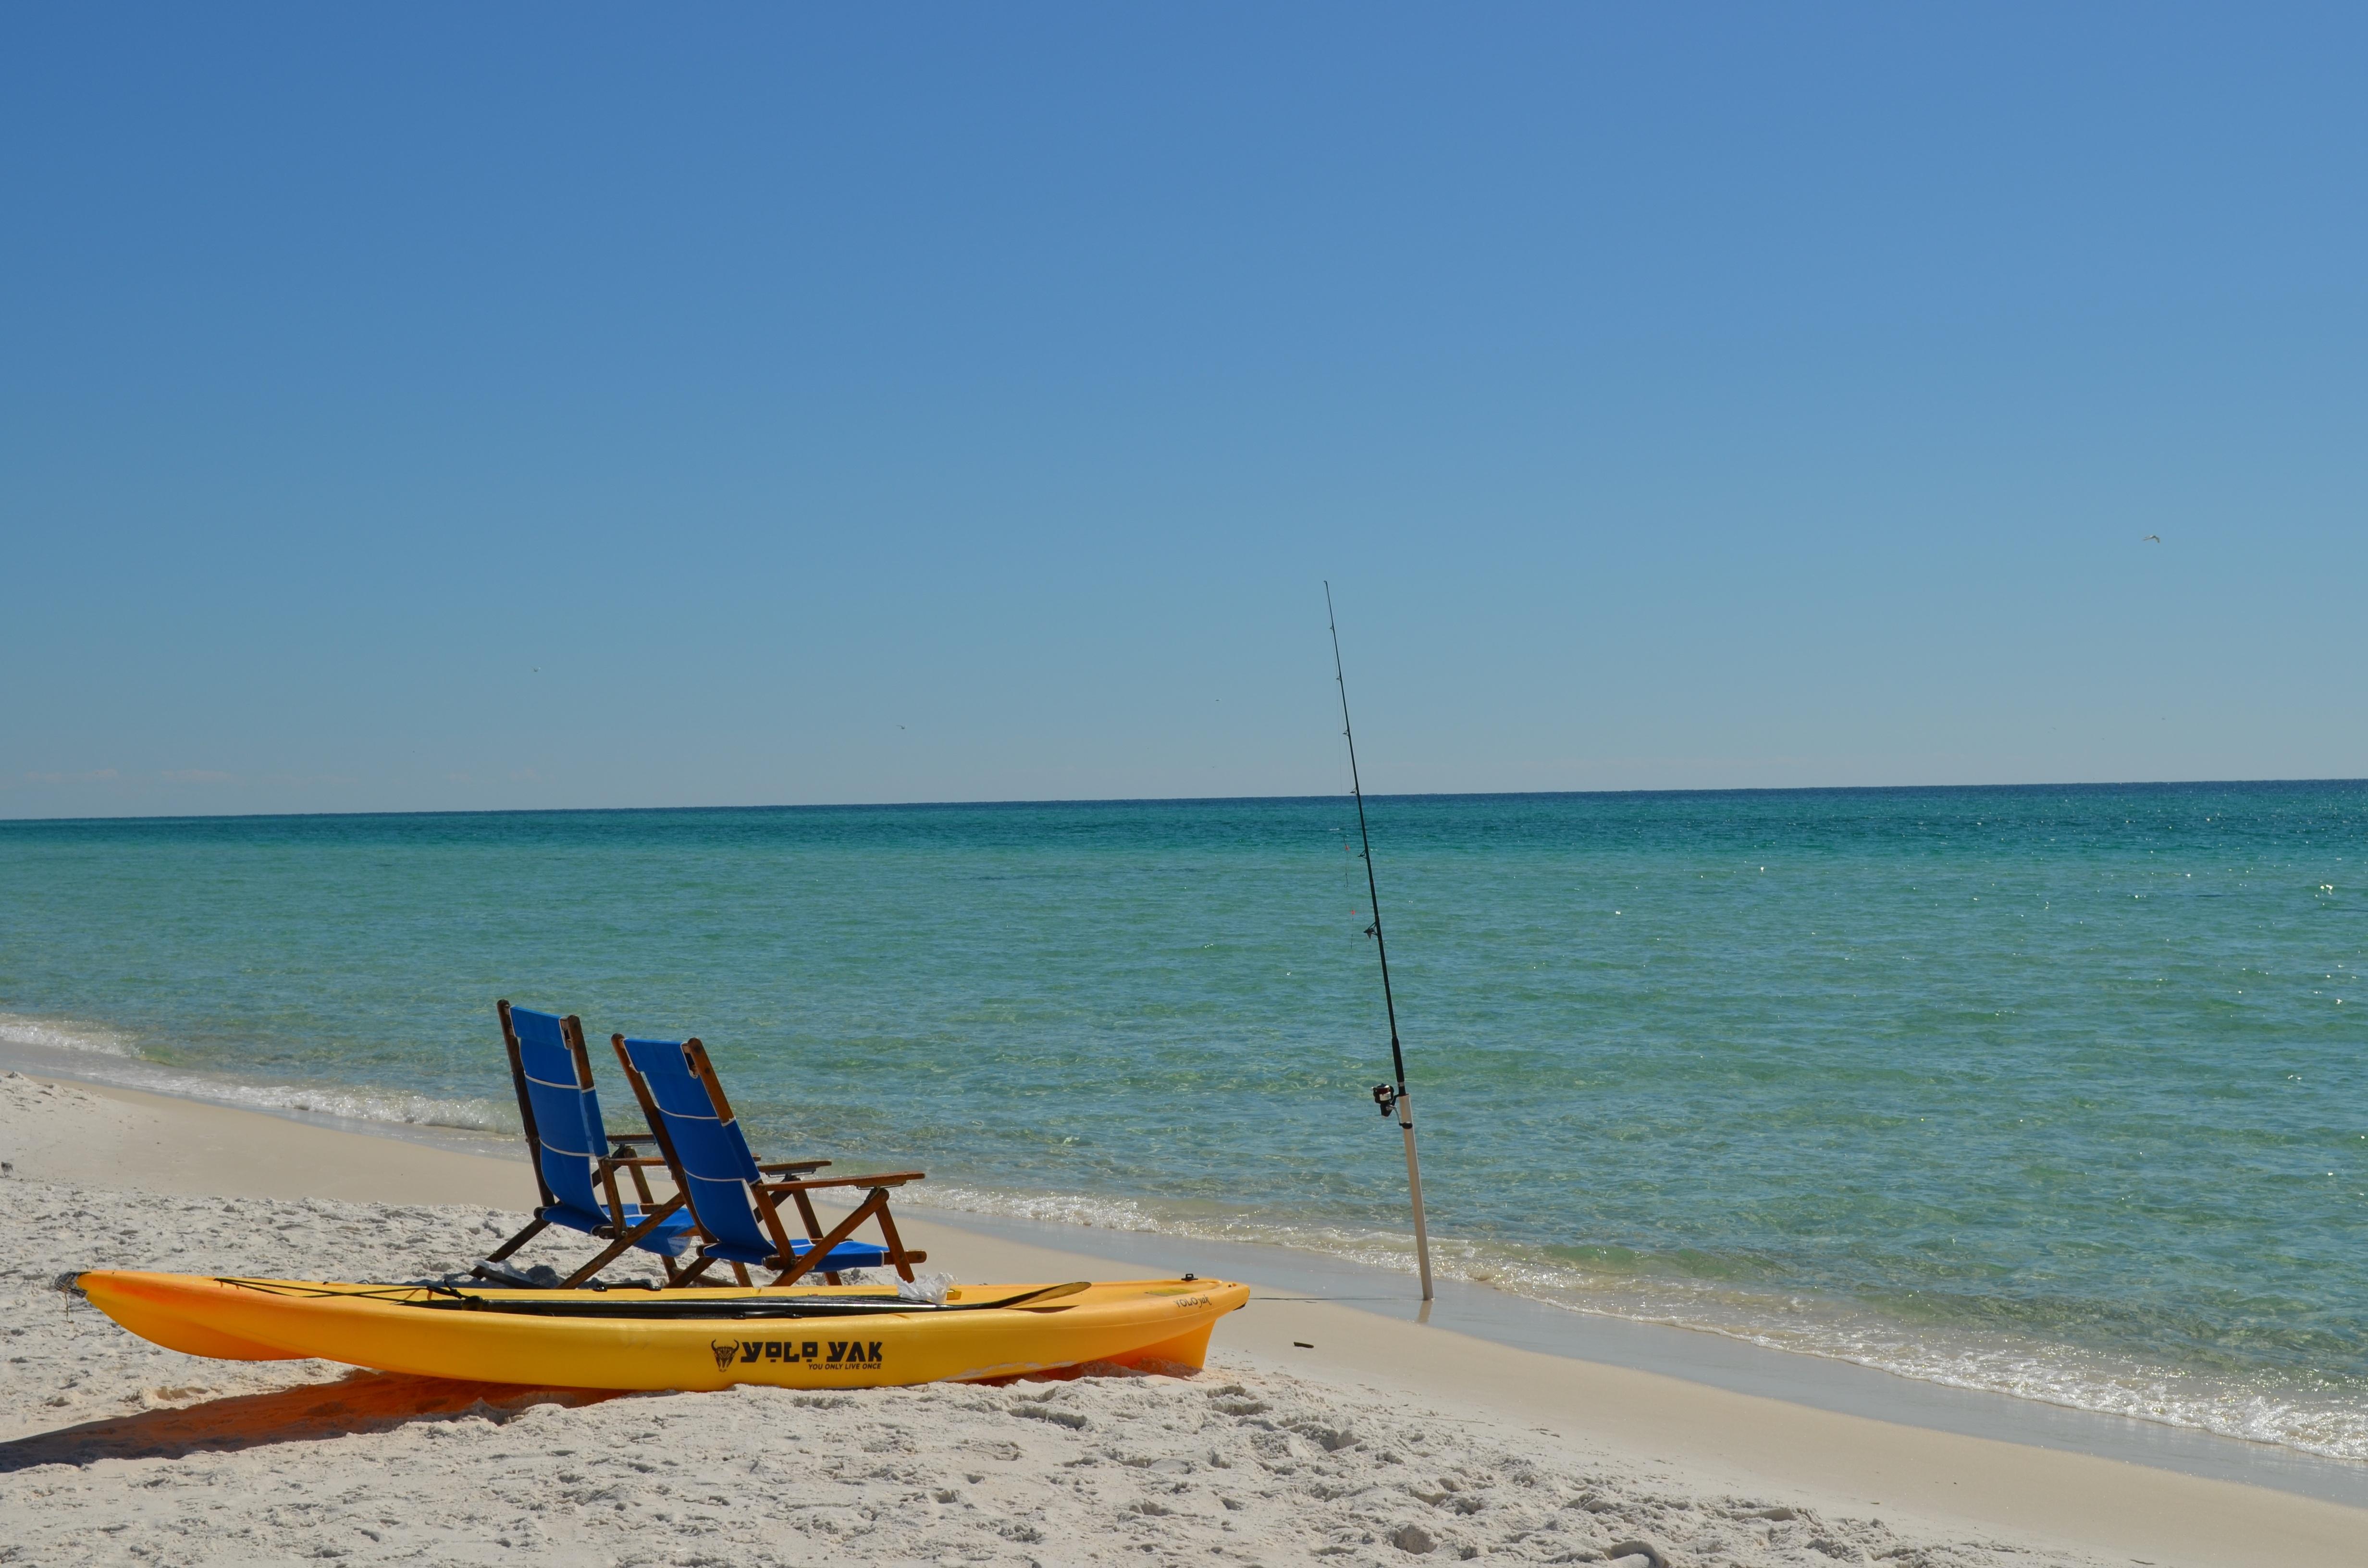 Free images sea coast sand ocean boat shore wind for Surf fishing panama city beach